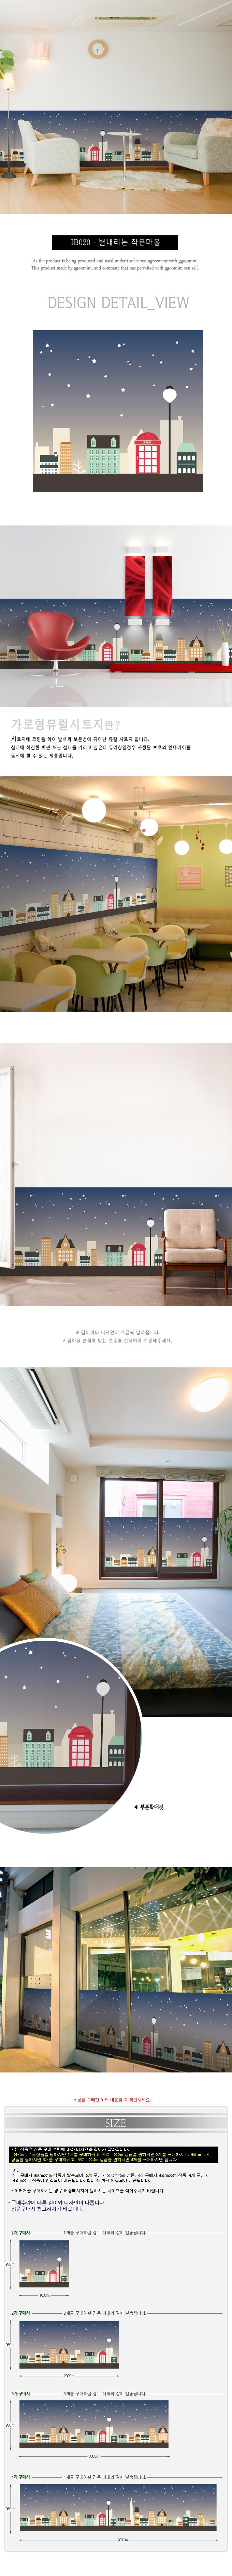 ib020-별내리는작은마을_가로형뮤럴시트지_뮤럴시트지 - 꾸밈, 22,400원, 벽지/시트지, 디자인 시트지